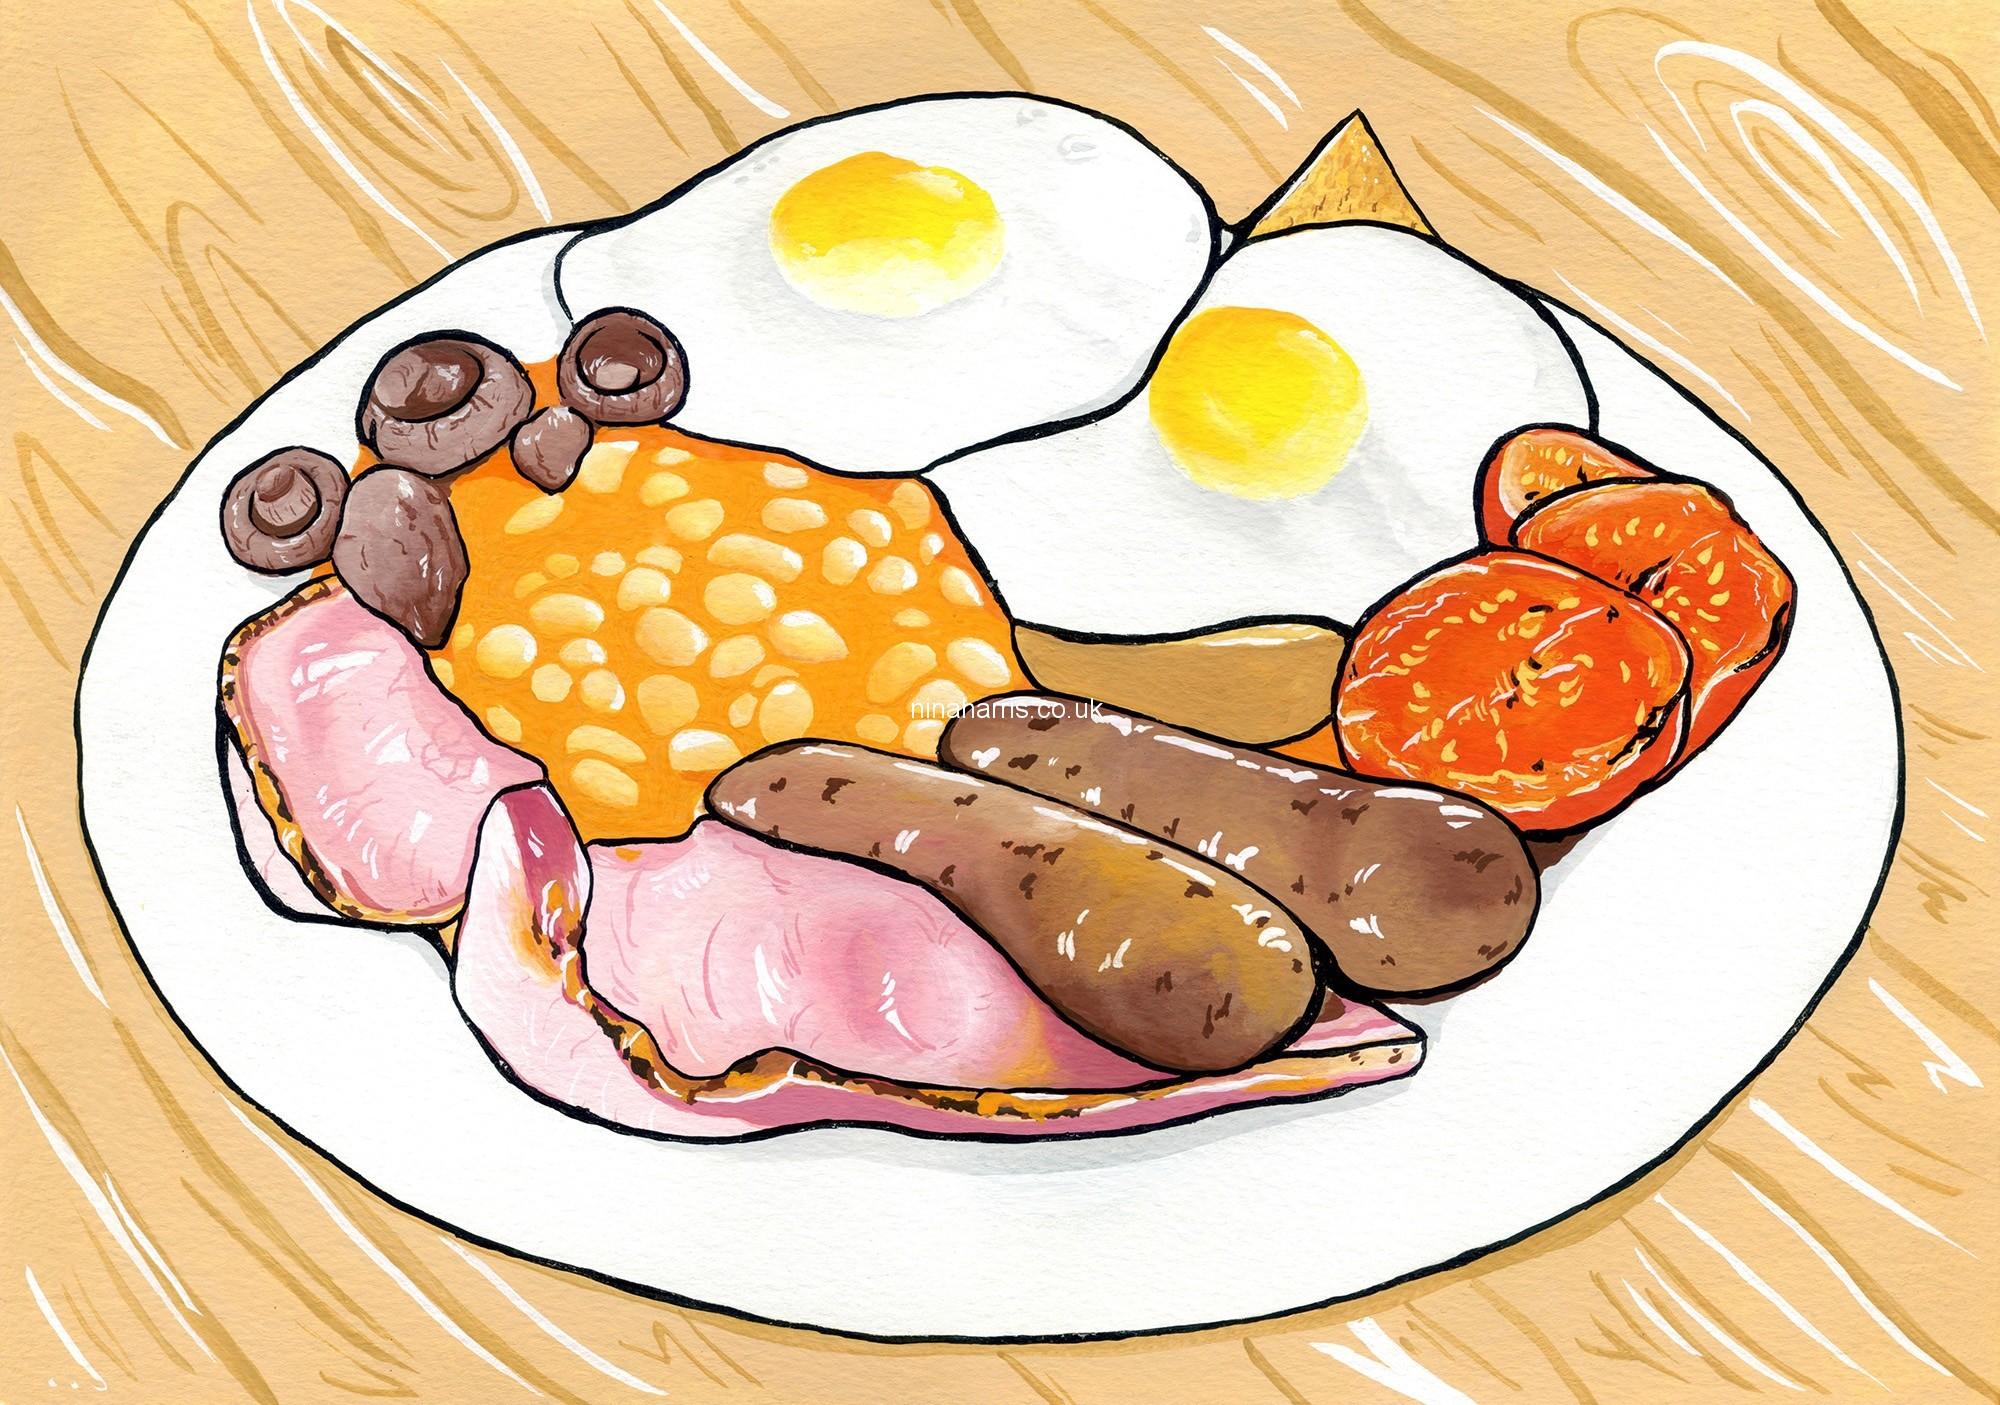 Breakfast clipart english breakfast, Picture #124770.